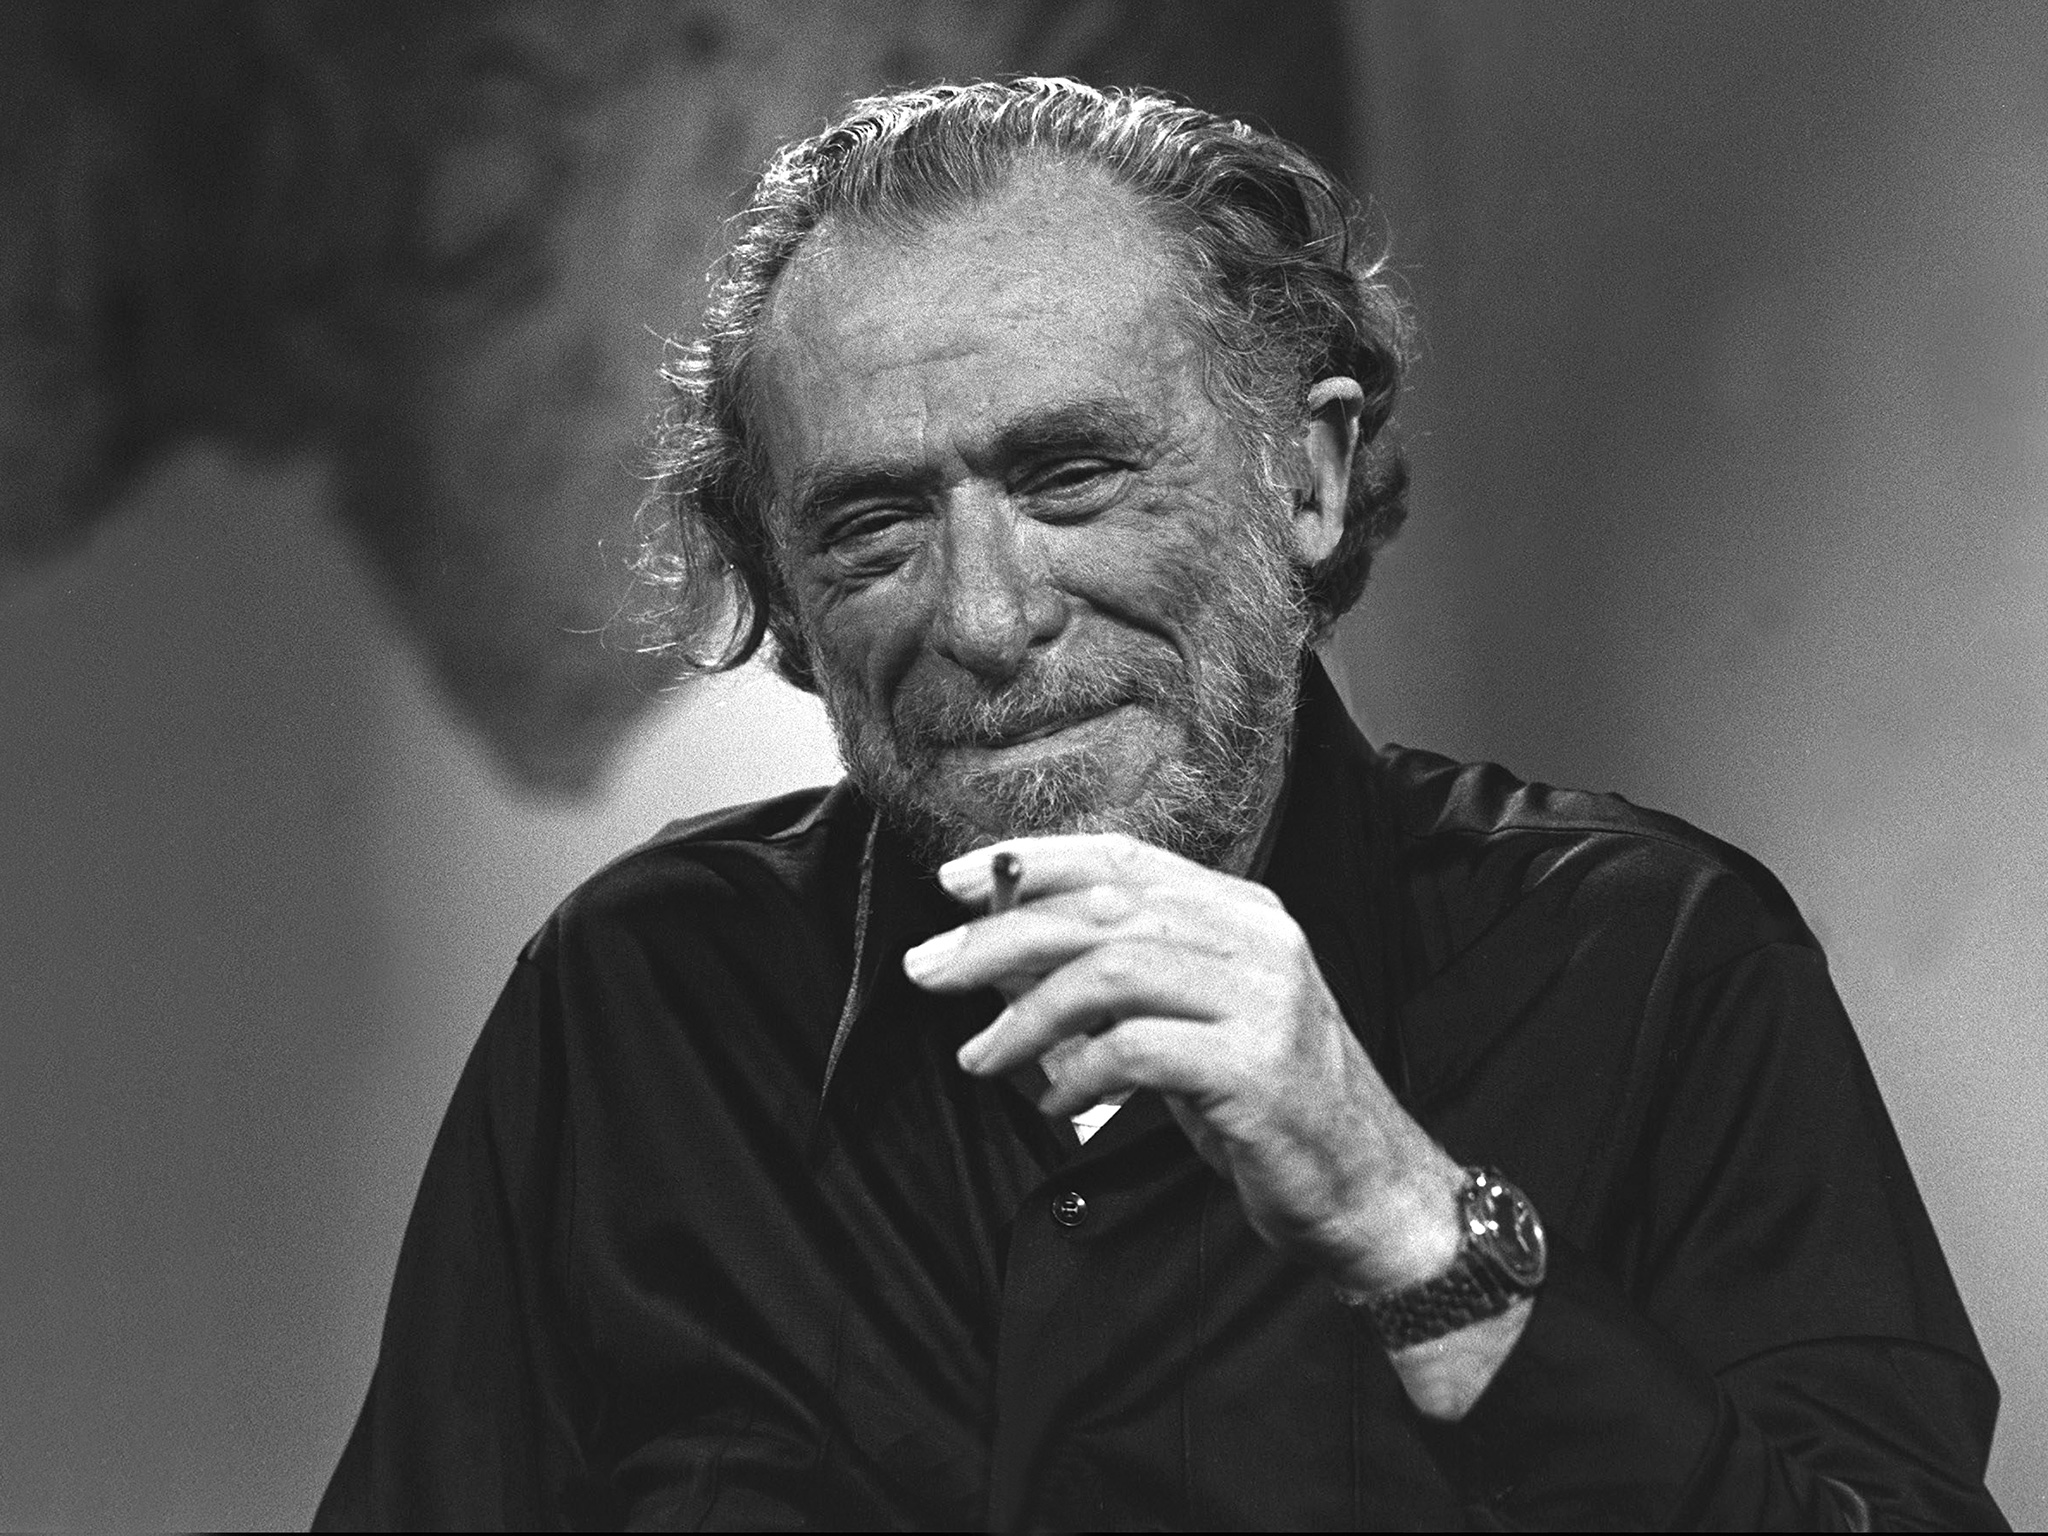 Charles Bukowski: donne, sensi di colpa e cattive abitudini